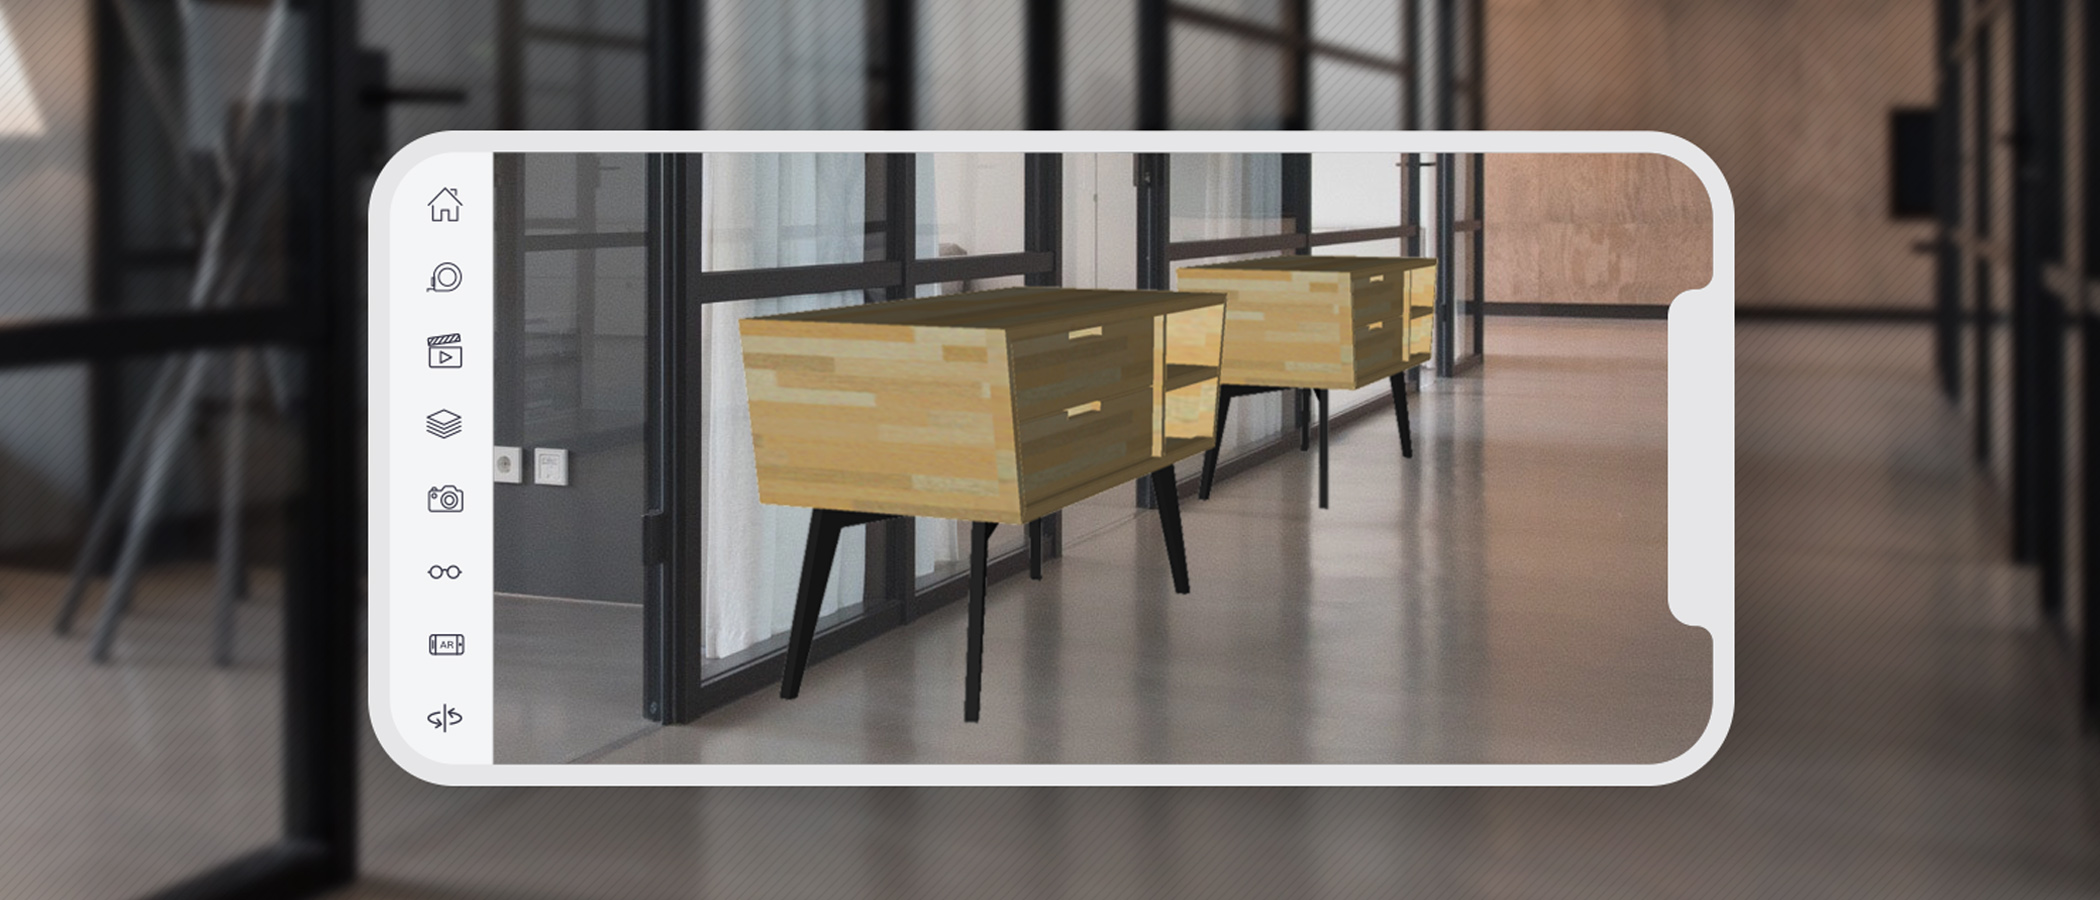 Przeglądarka modeli 3D   SketchUp Viewer   Technologie AR, VR, MR